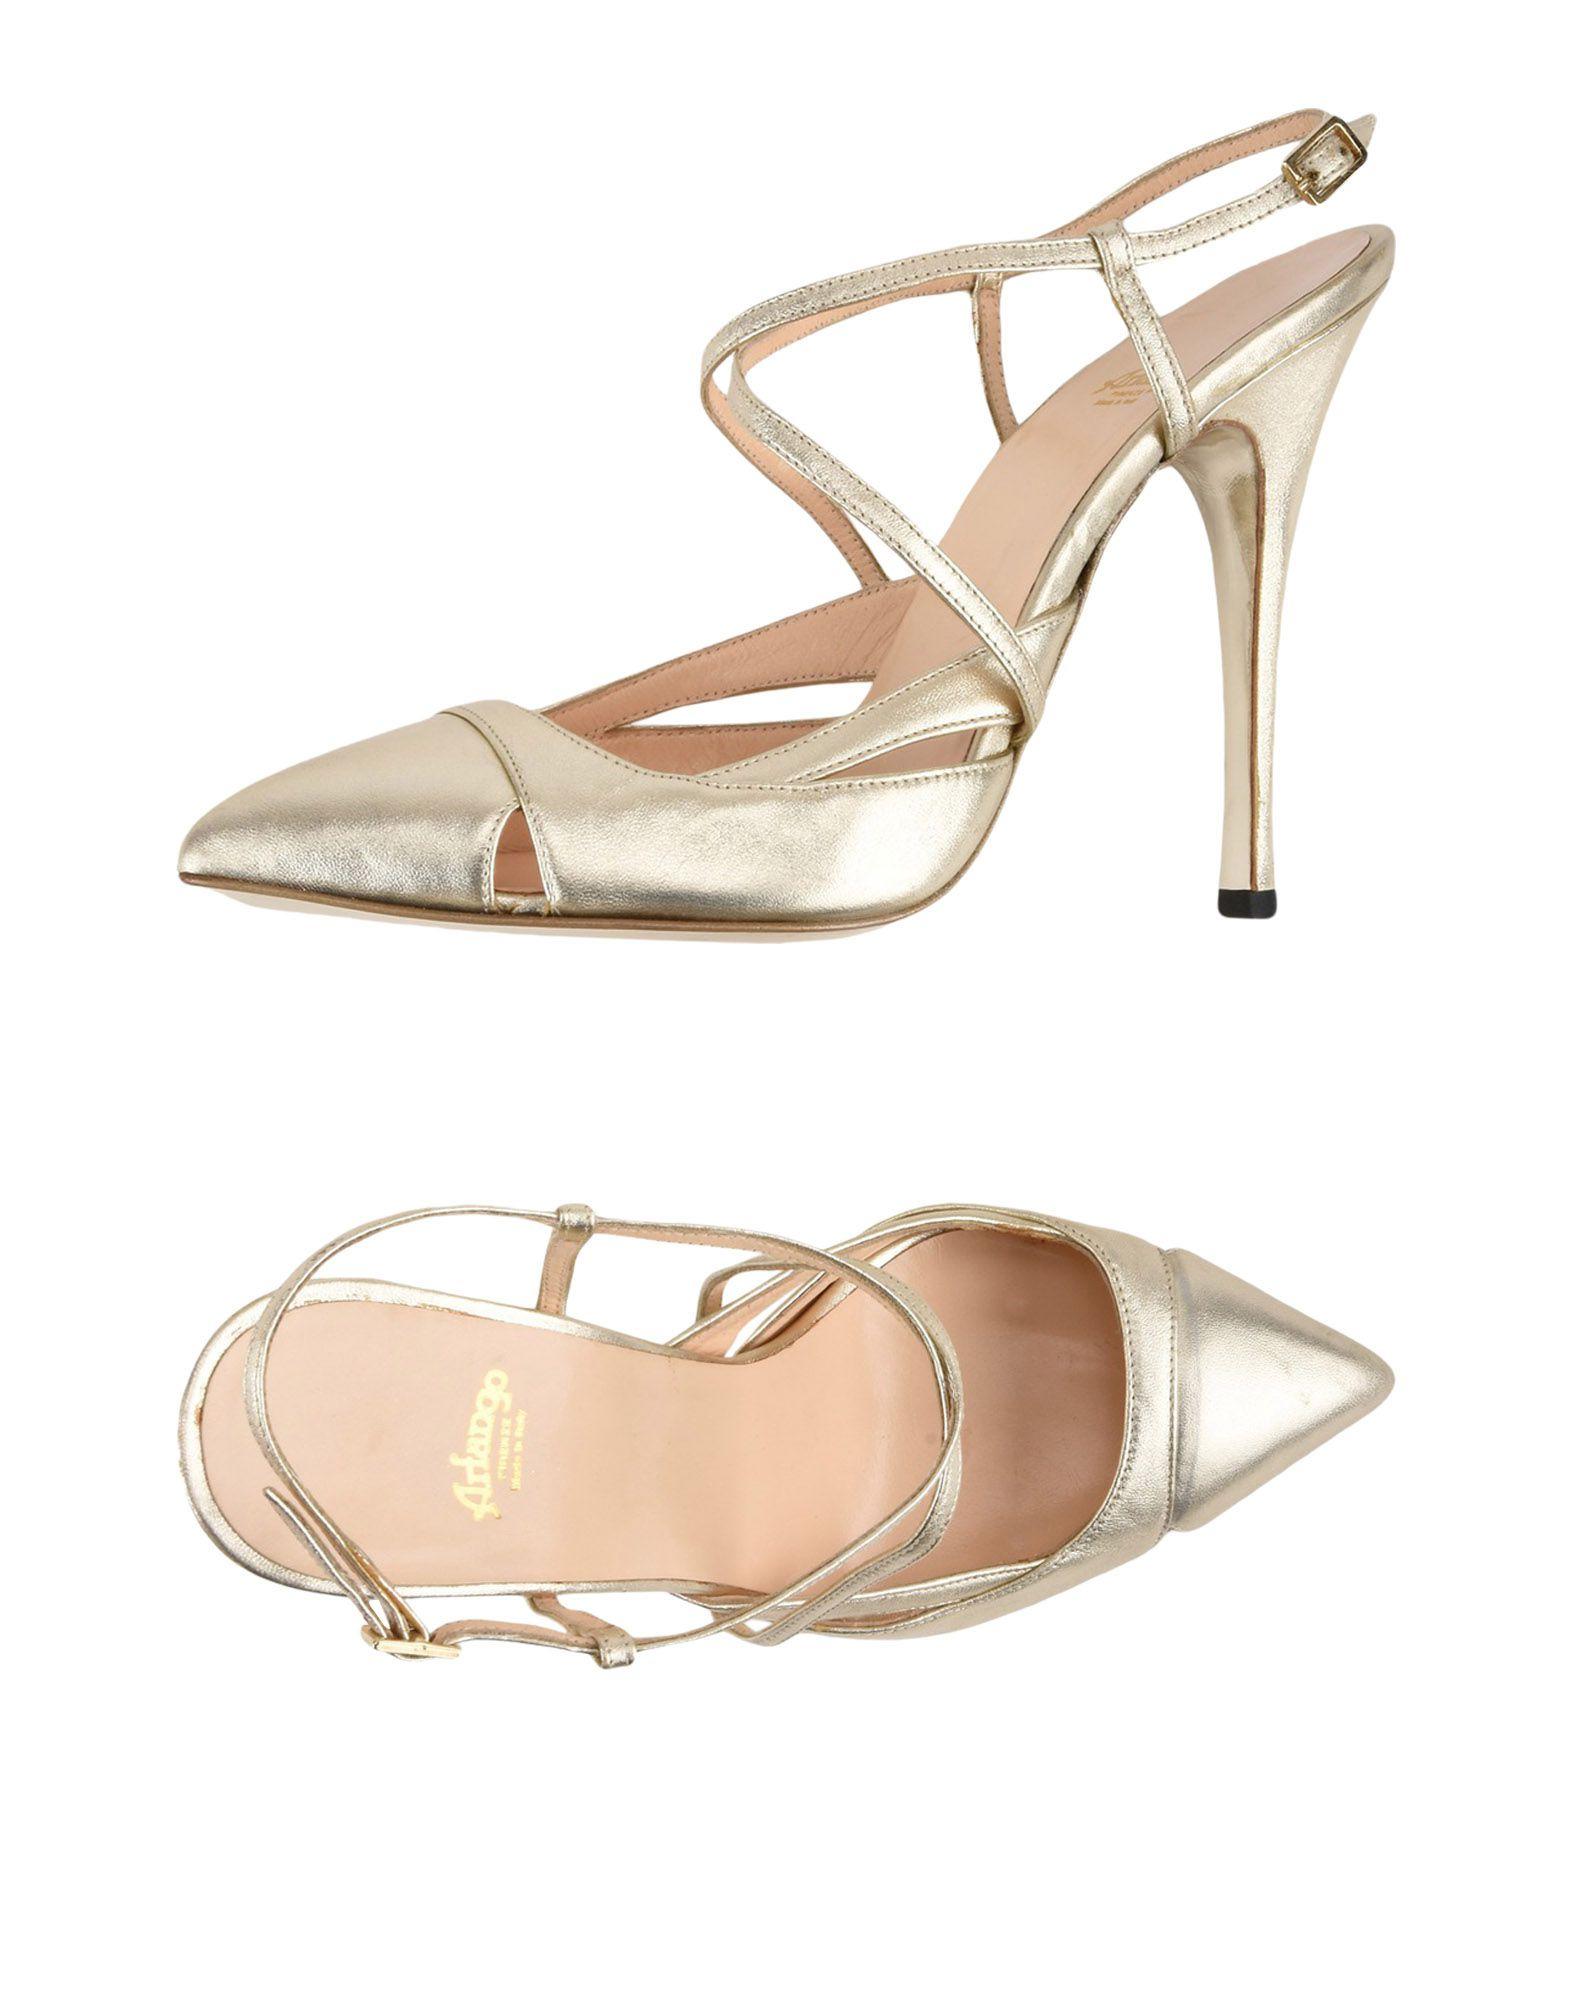 Stilvolle Arfango billige Schuhe Arfango Stilvolle Pumps Damen  11475629JJ b7065b